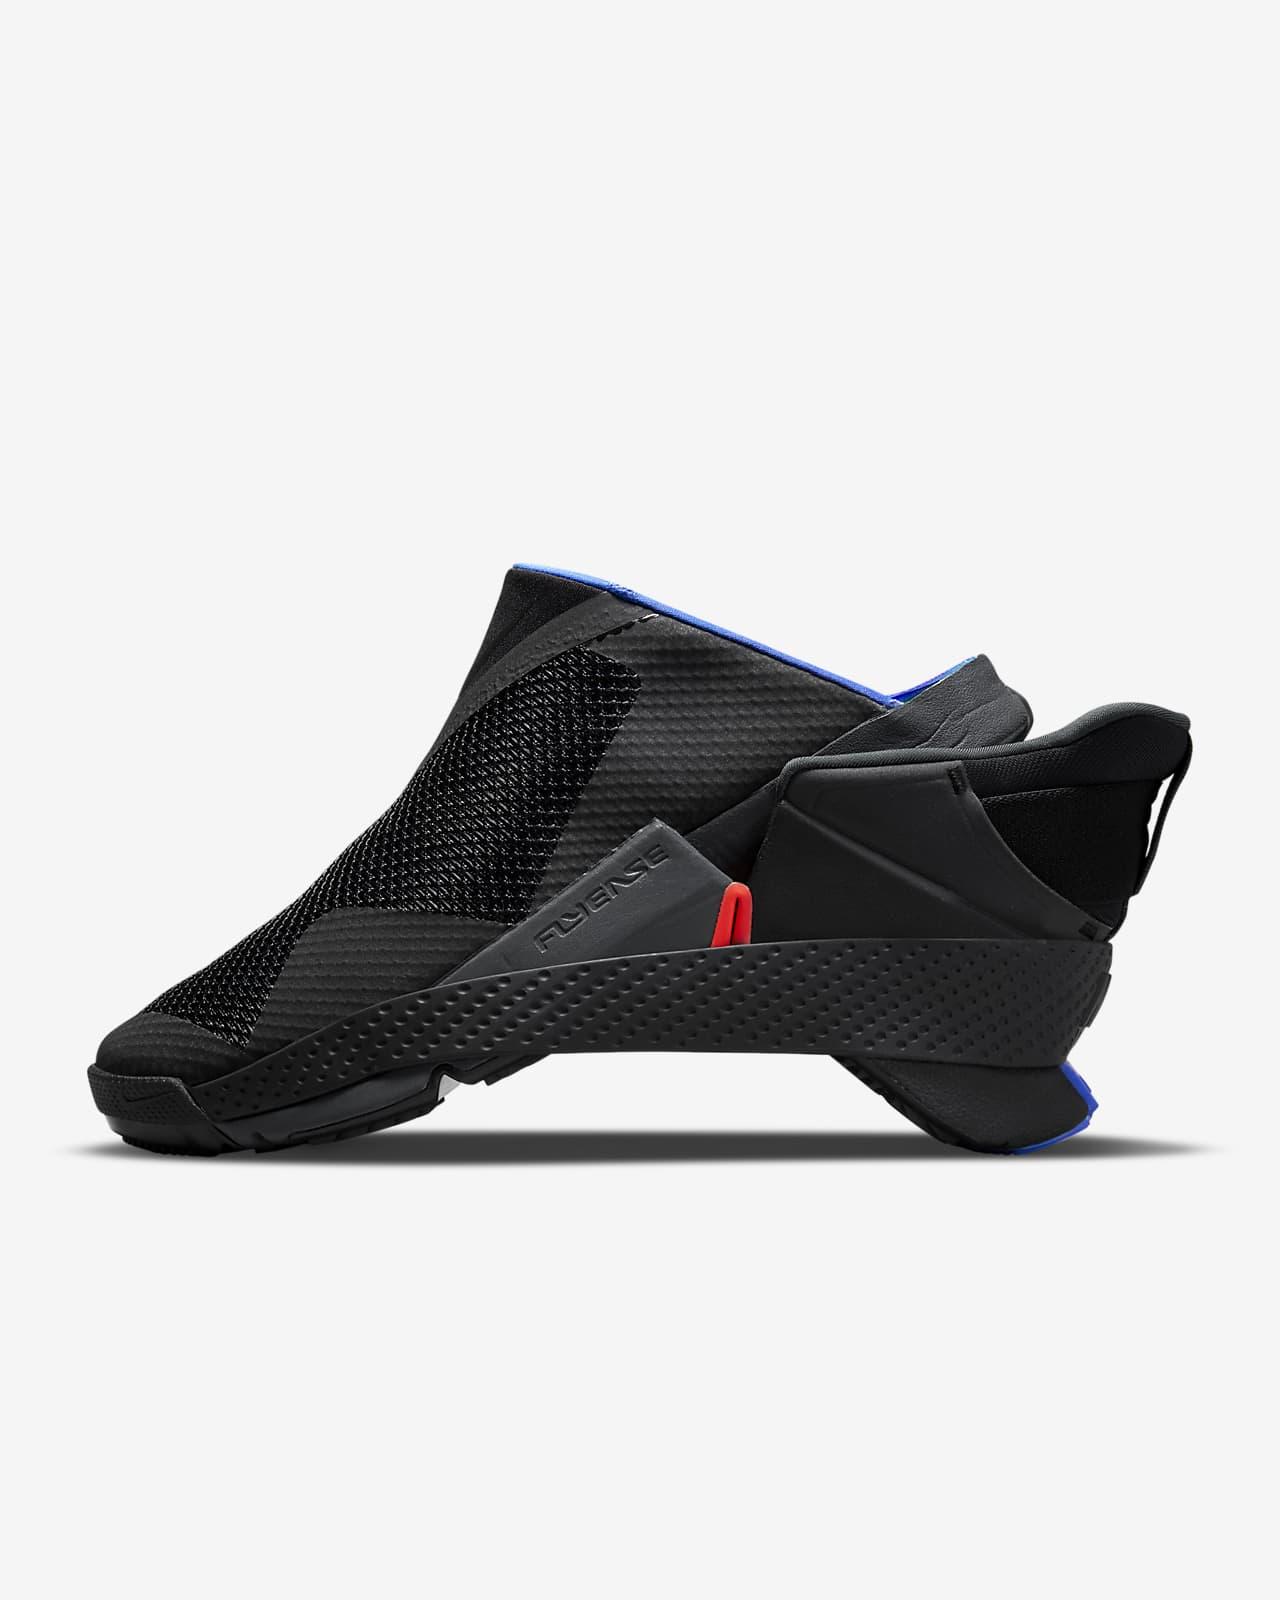 Nike Go FlyEase Schuh